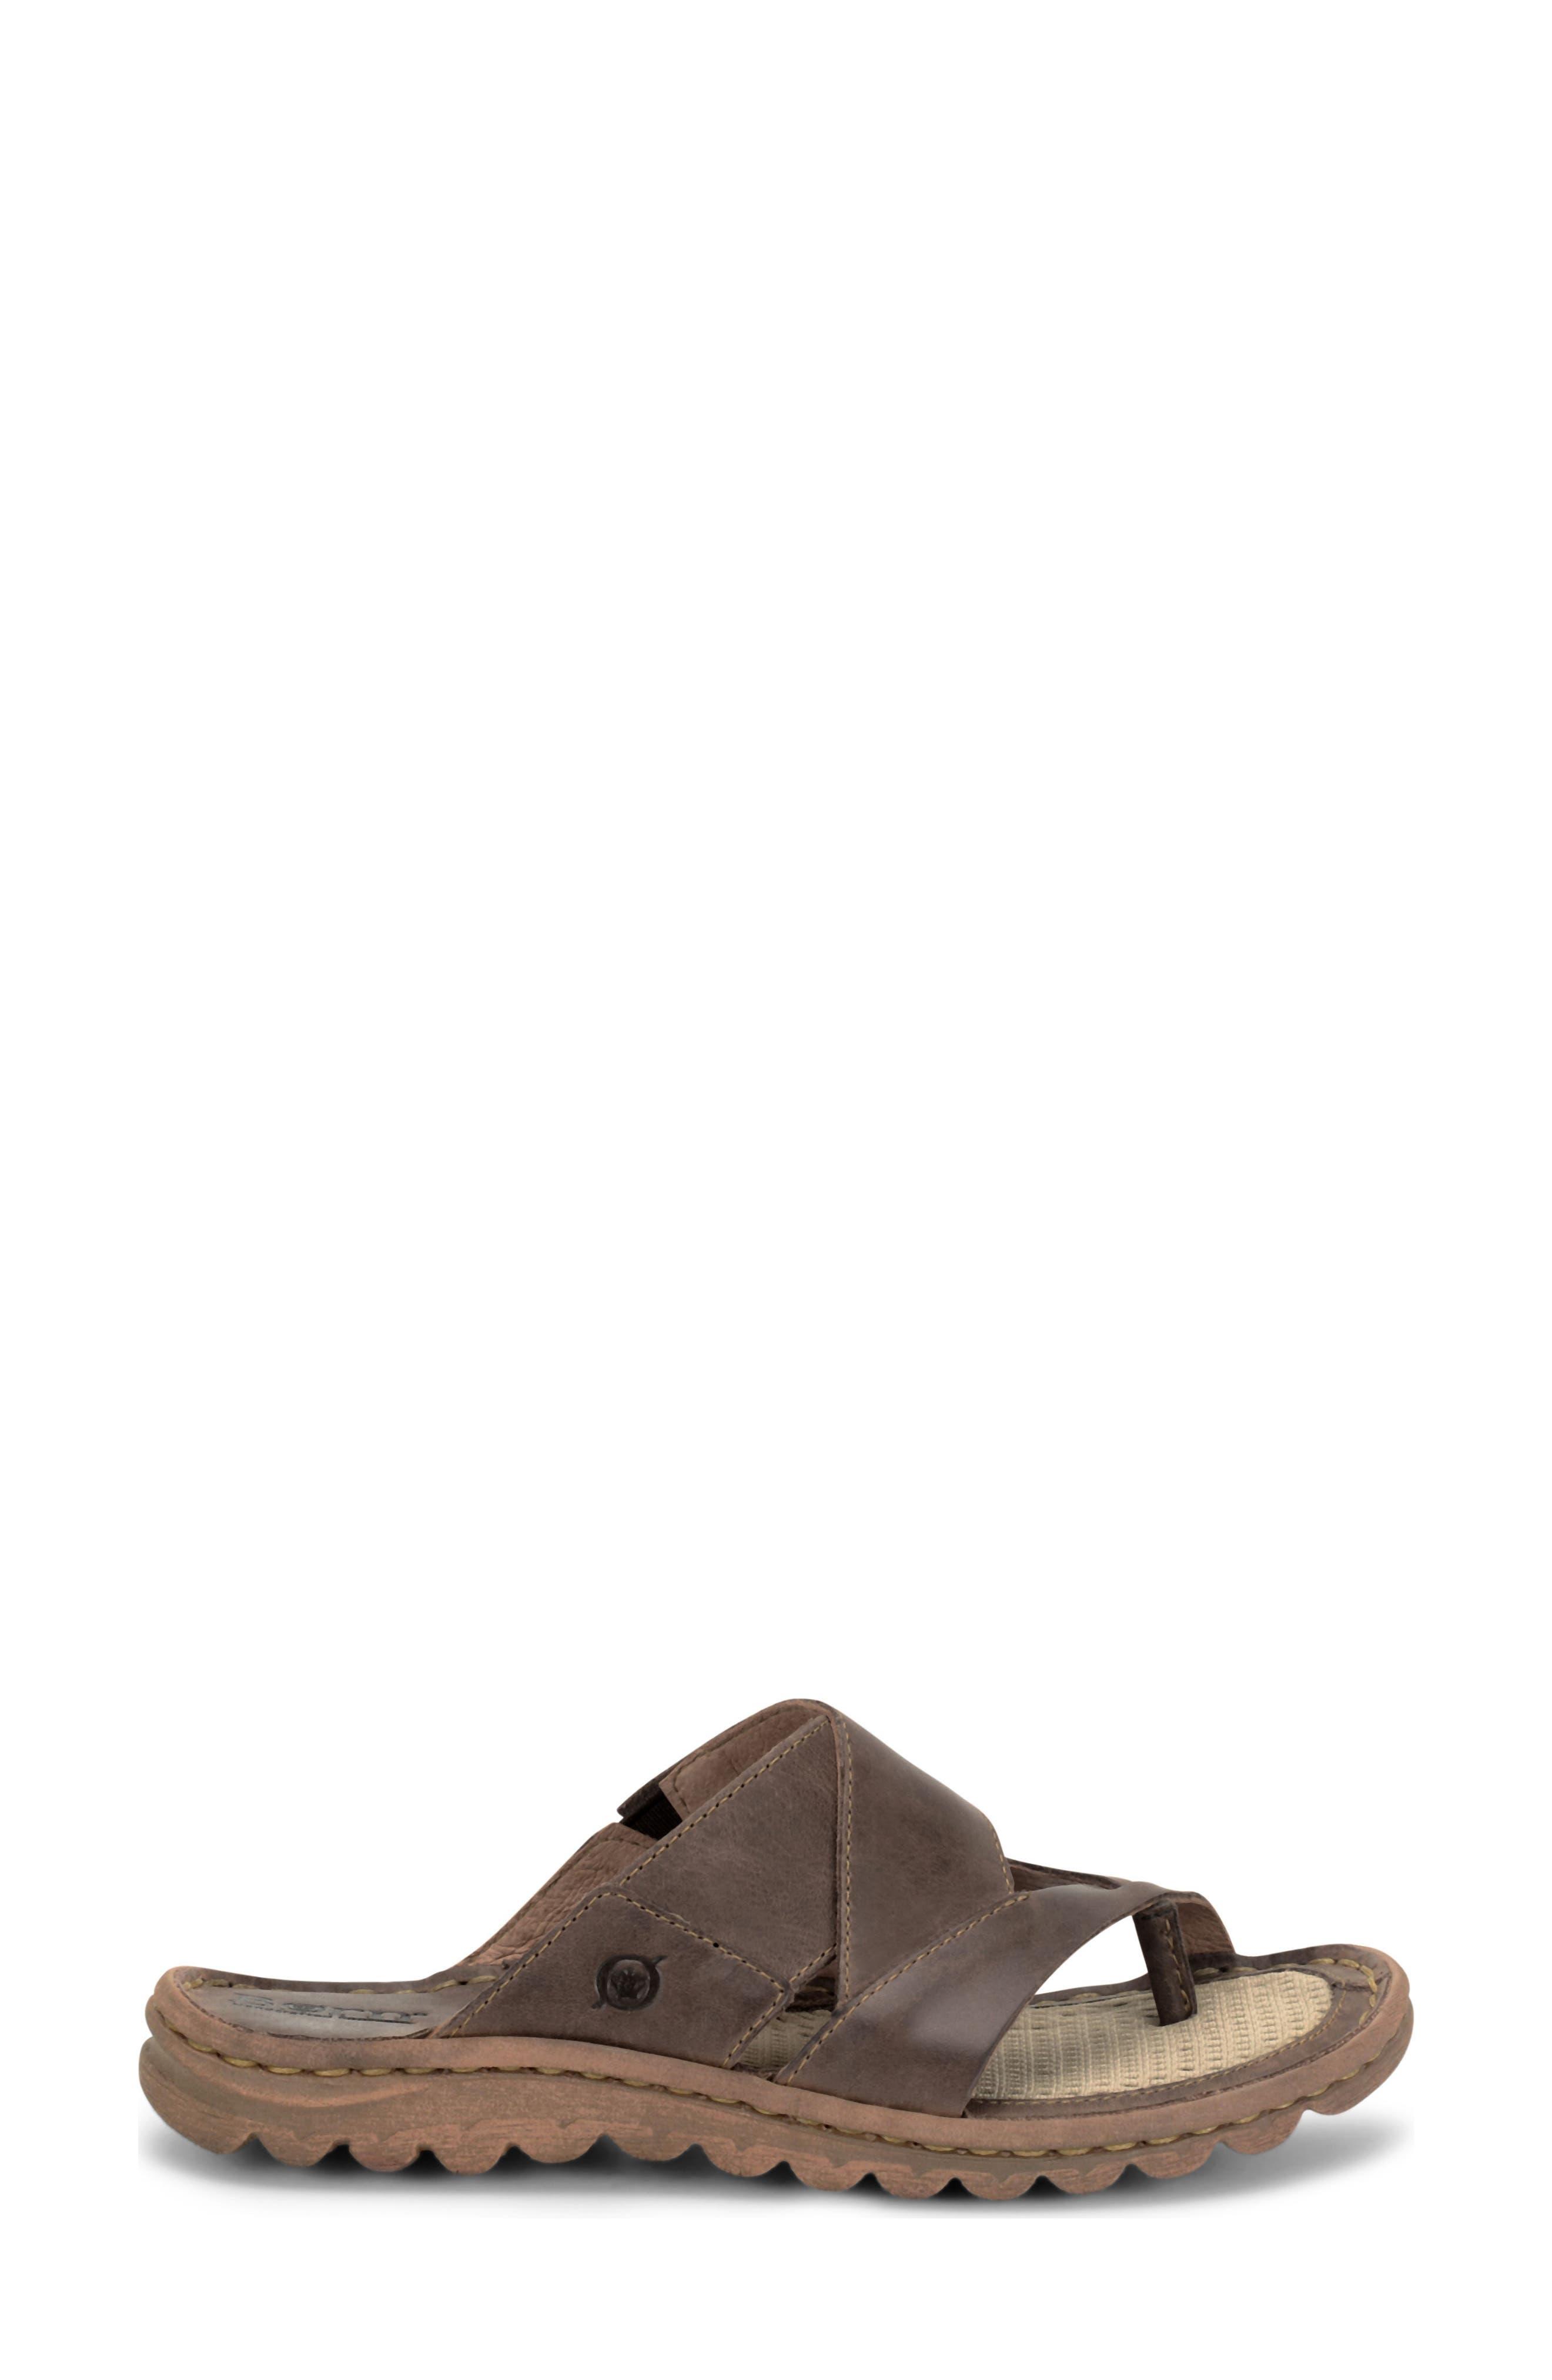 'Sorja' Leather Sandal,                             Alternate thumbnail 3, color,                             Dark Brown Leather